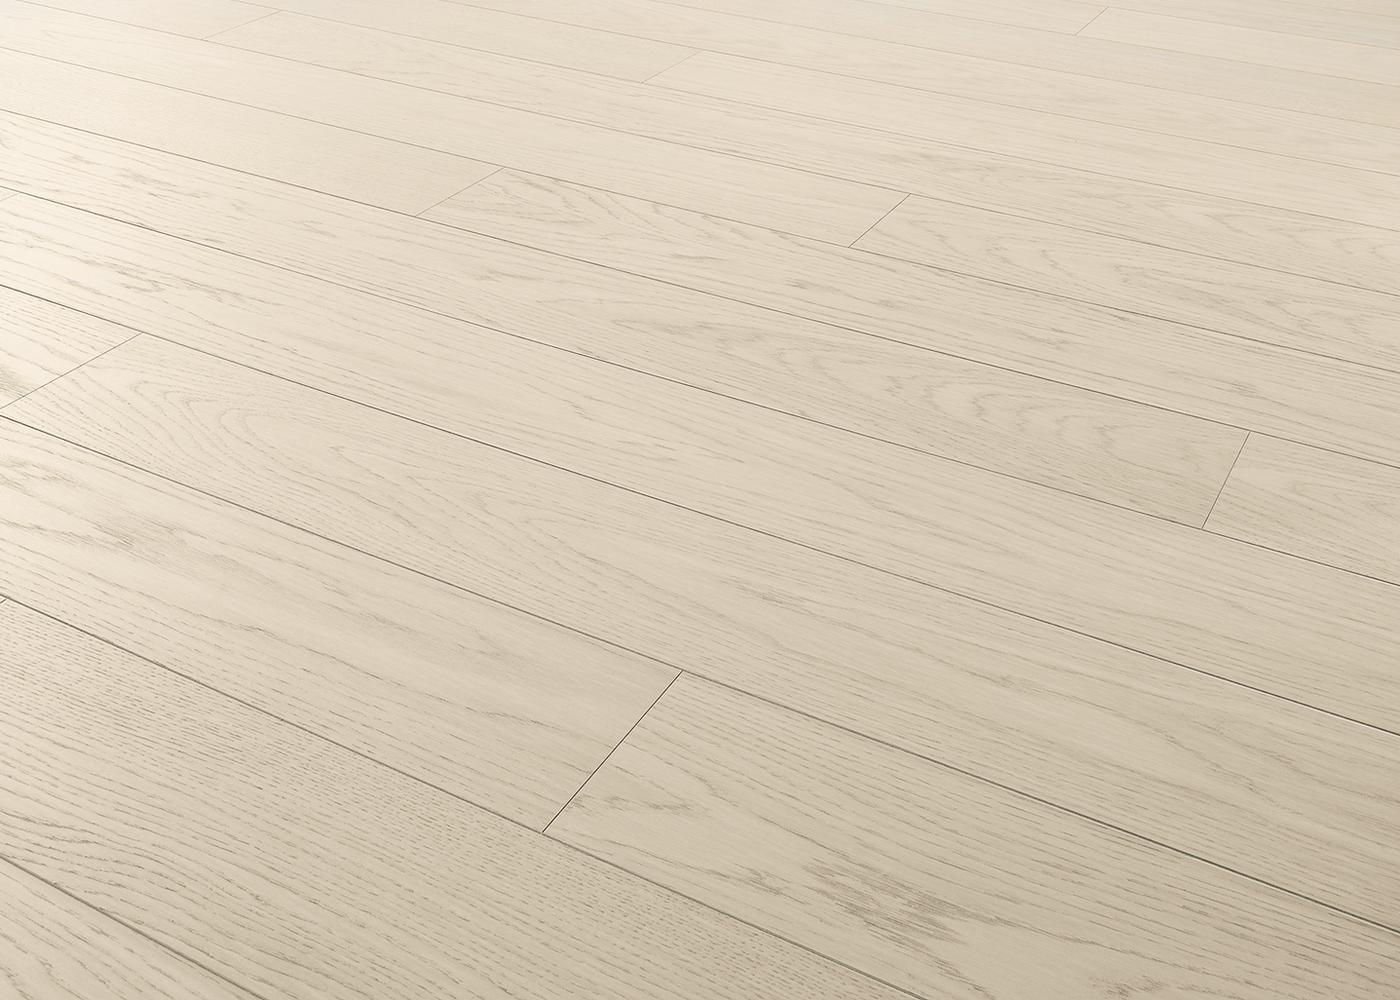 Sol plaqué bois Chêne Odessa brossé vernis extra-mat - Deluxe - Select 12x166x1810